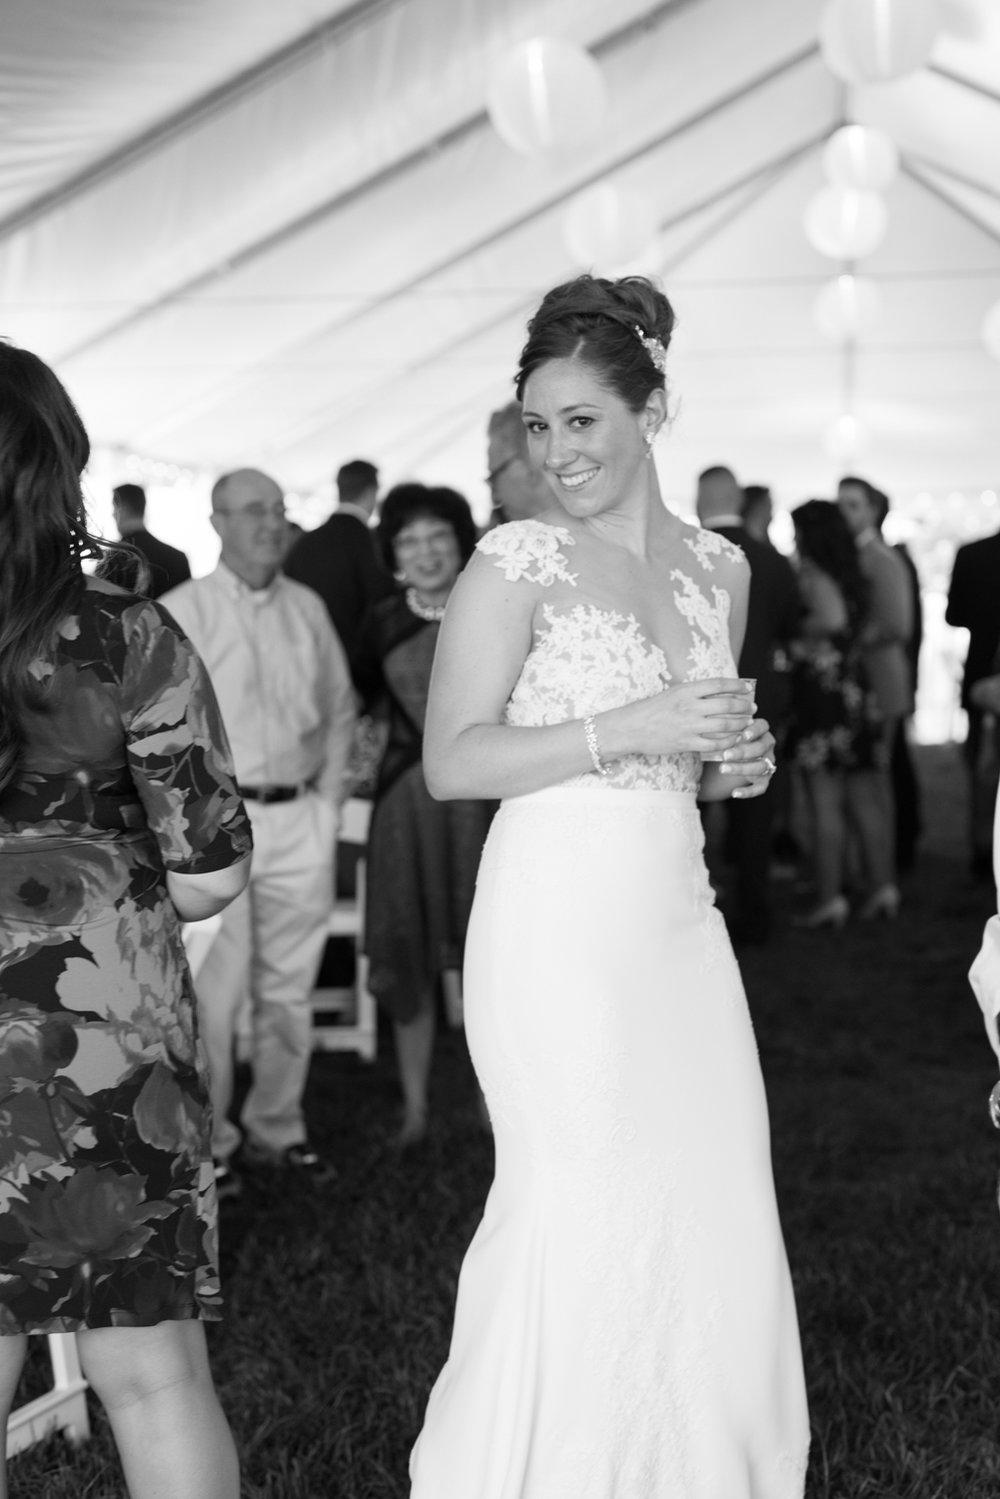 Lauren+AJ- DIY Backyard Wedding- New Jersey- Olivia Christina Photo-306.JPG